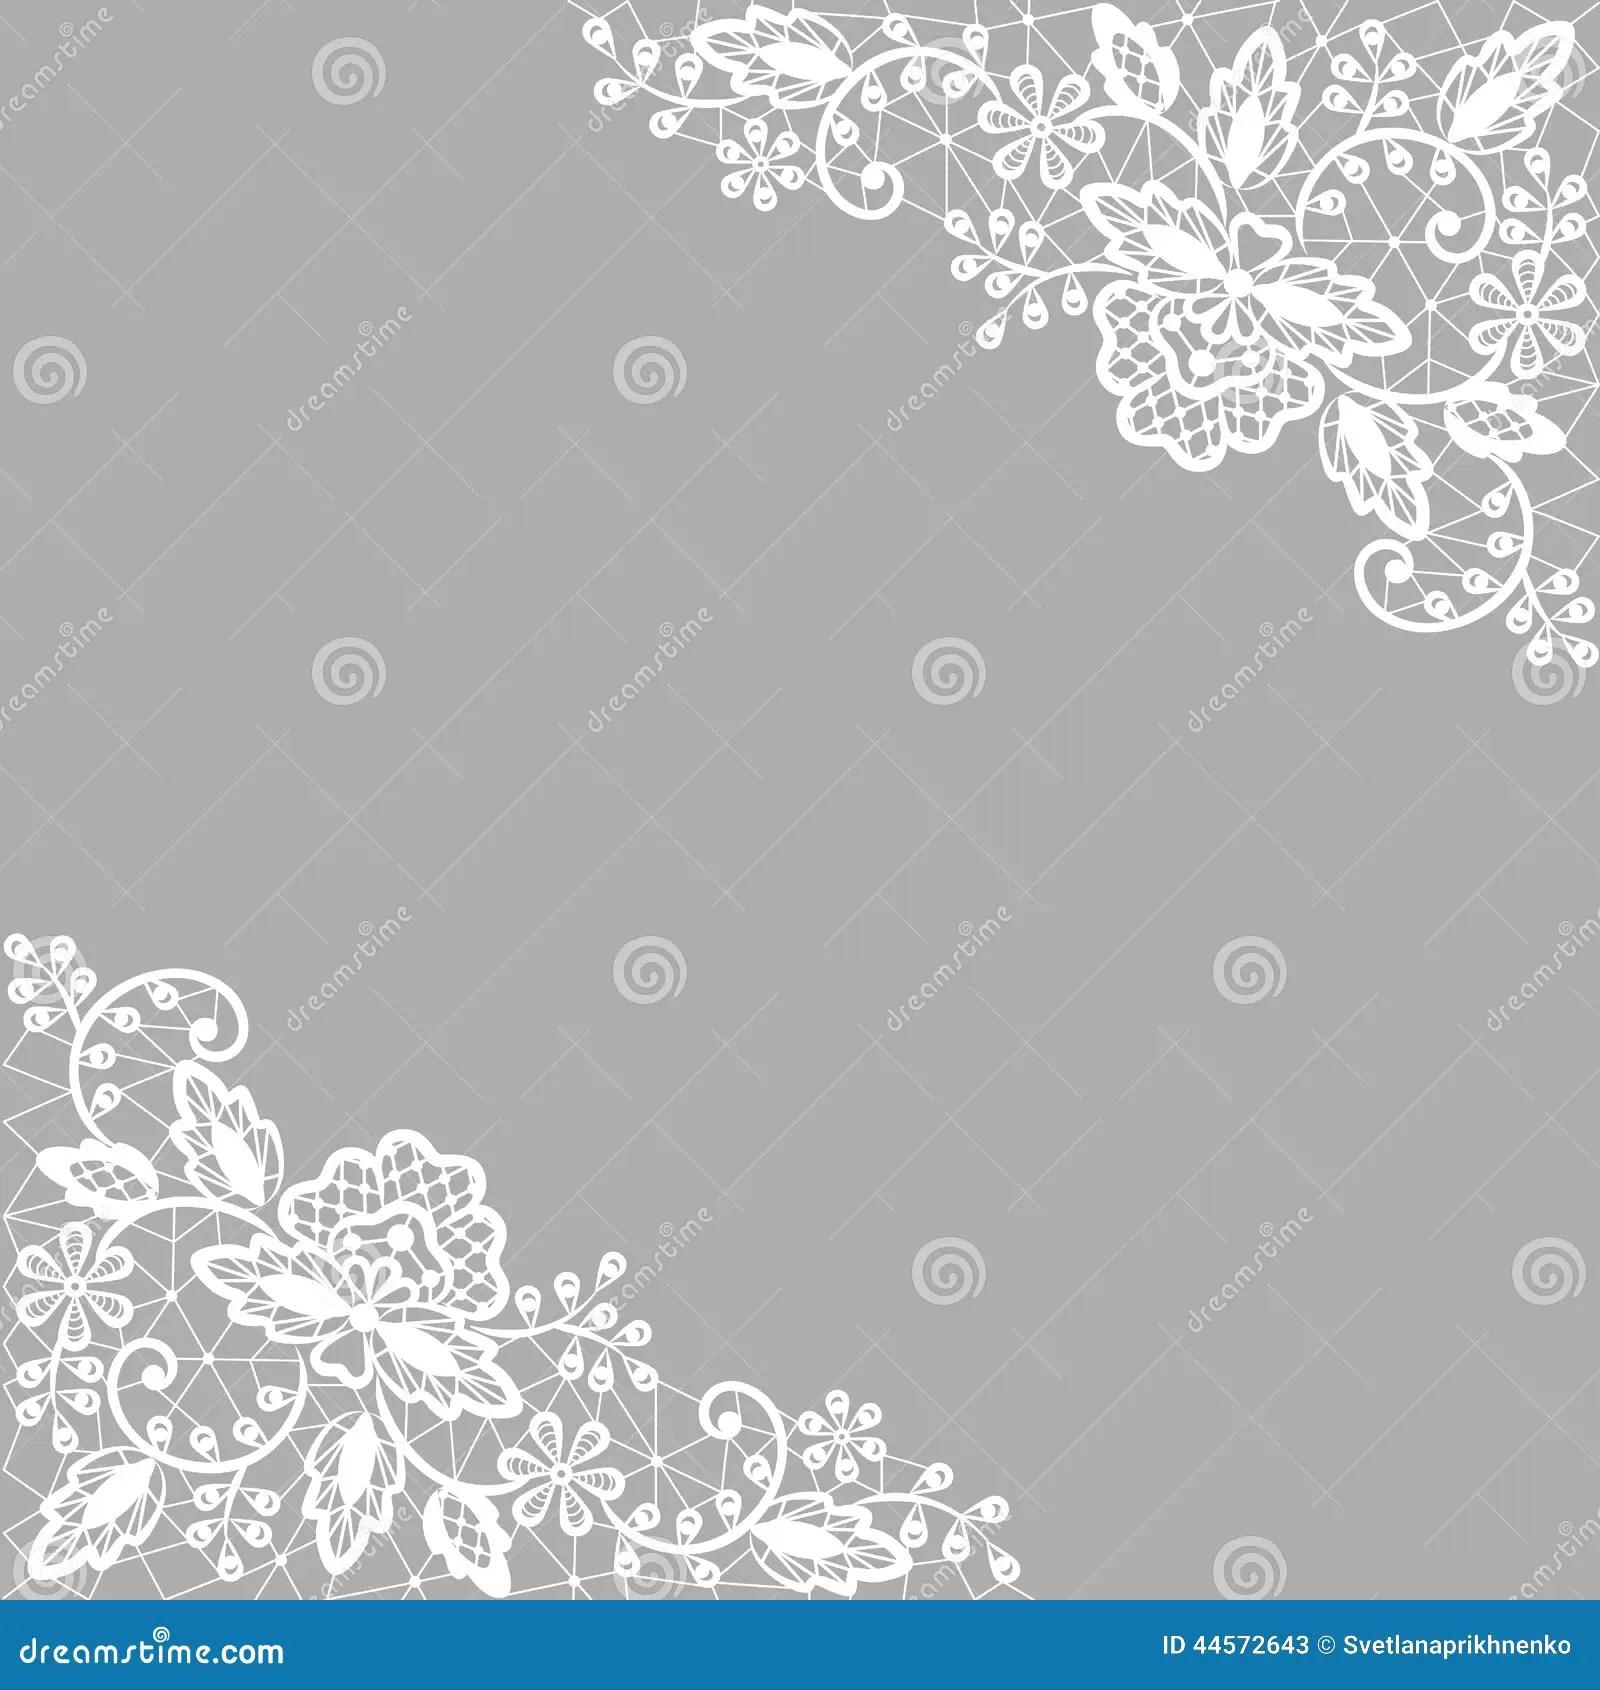 Design For Wedding Border